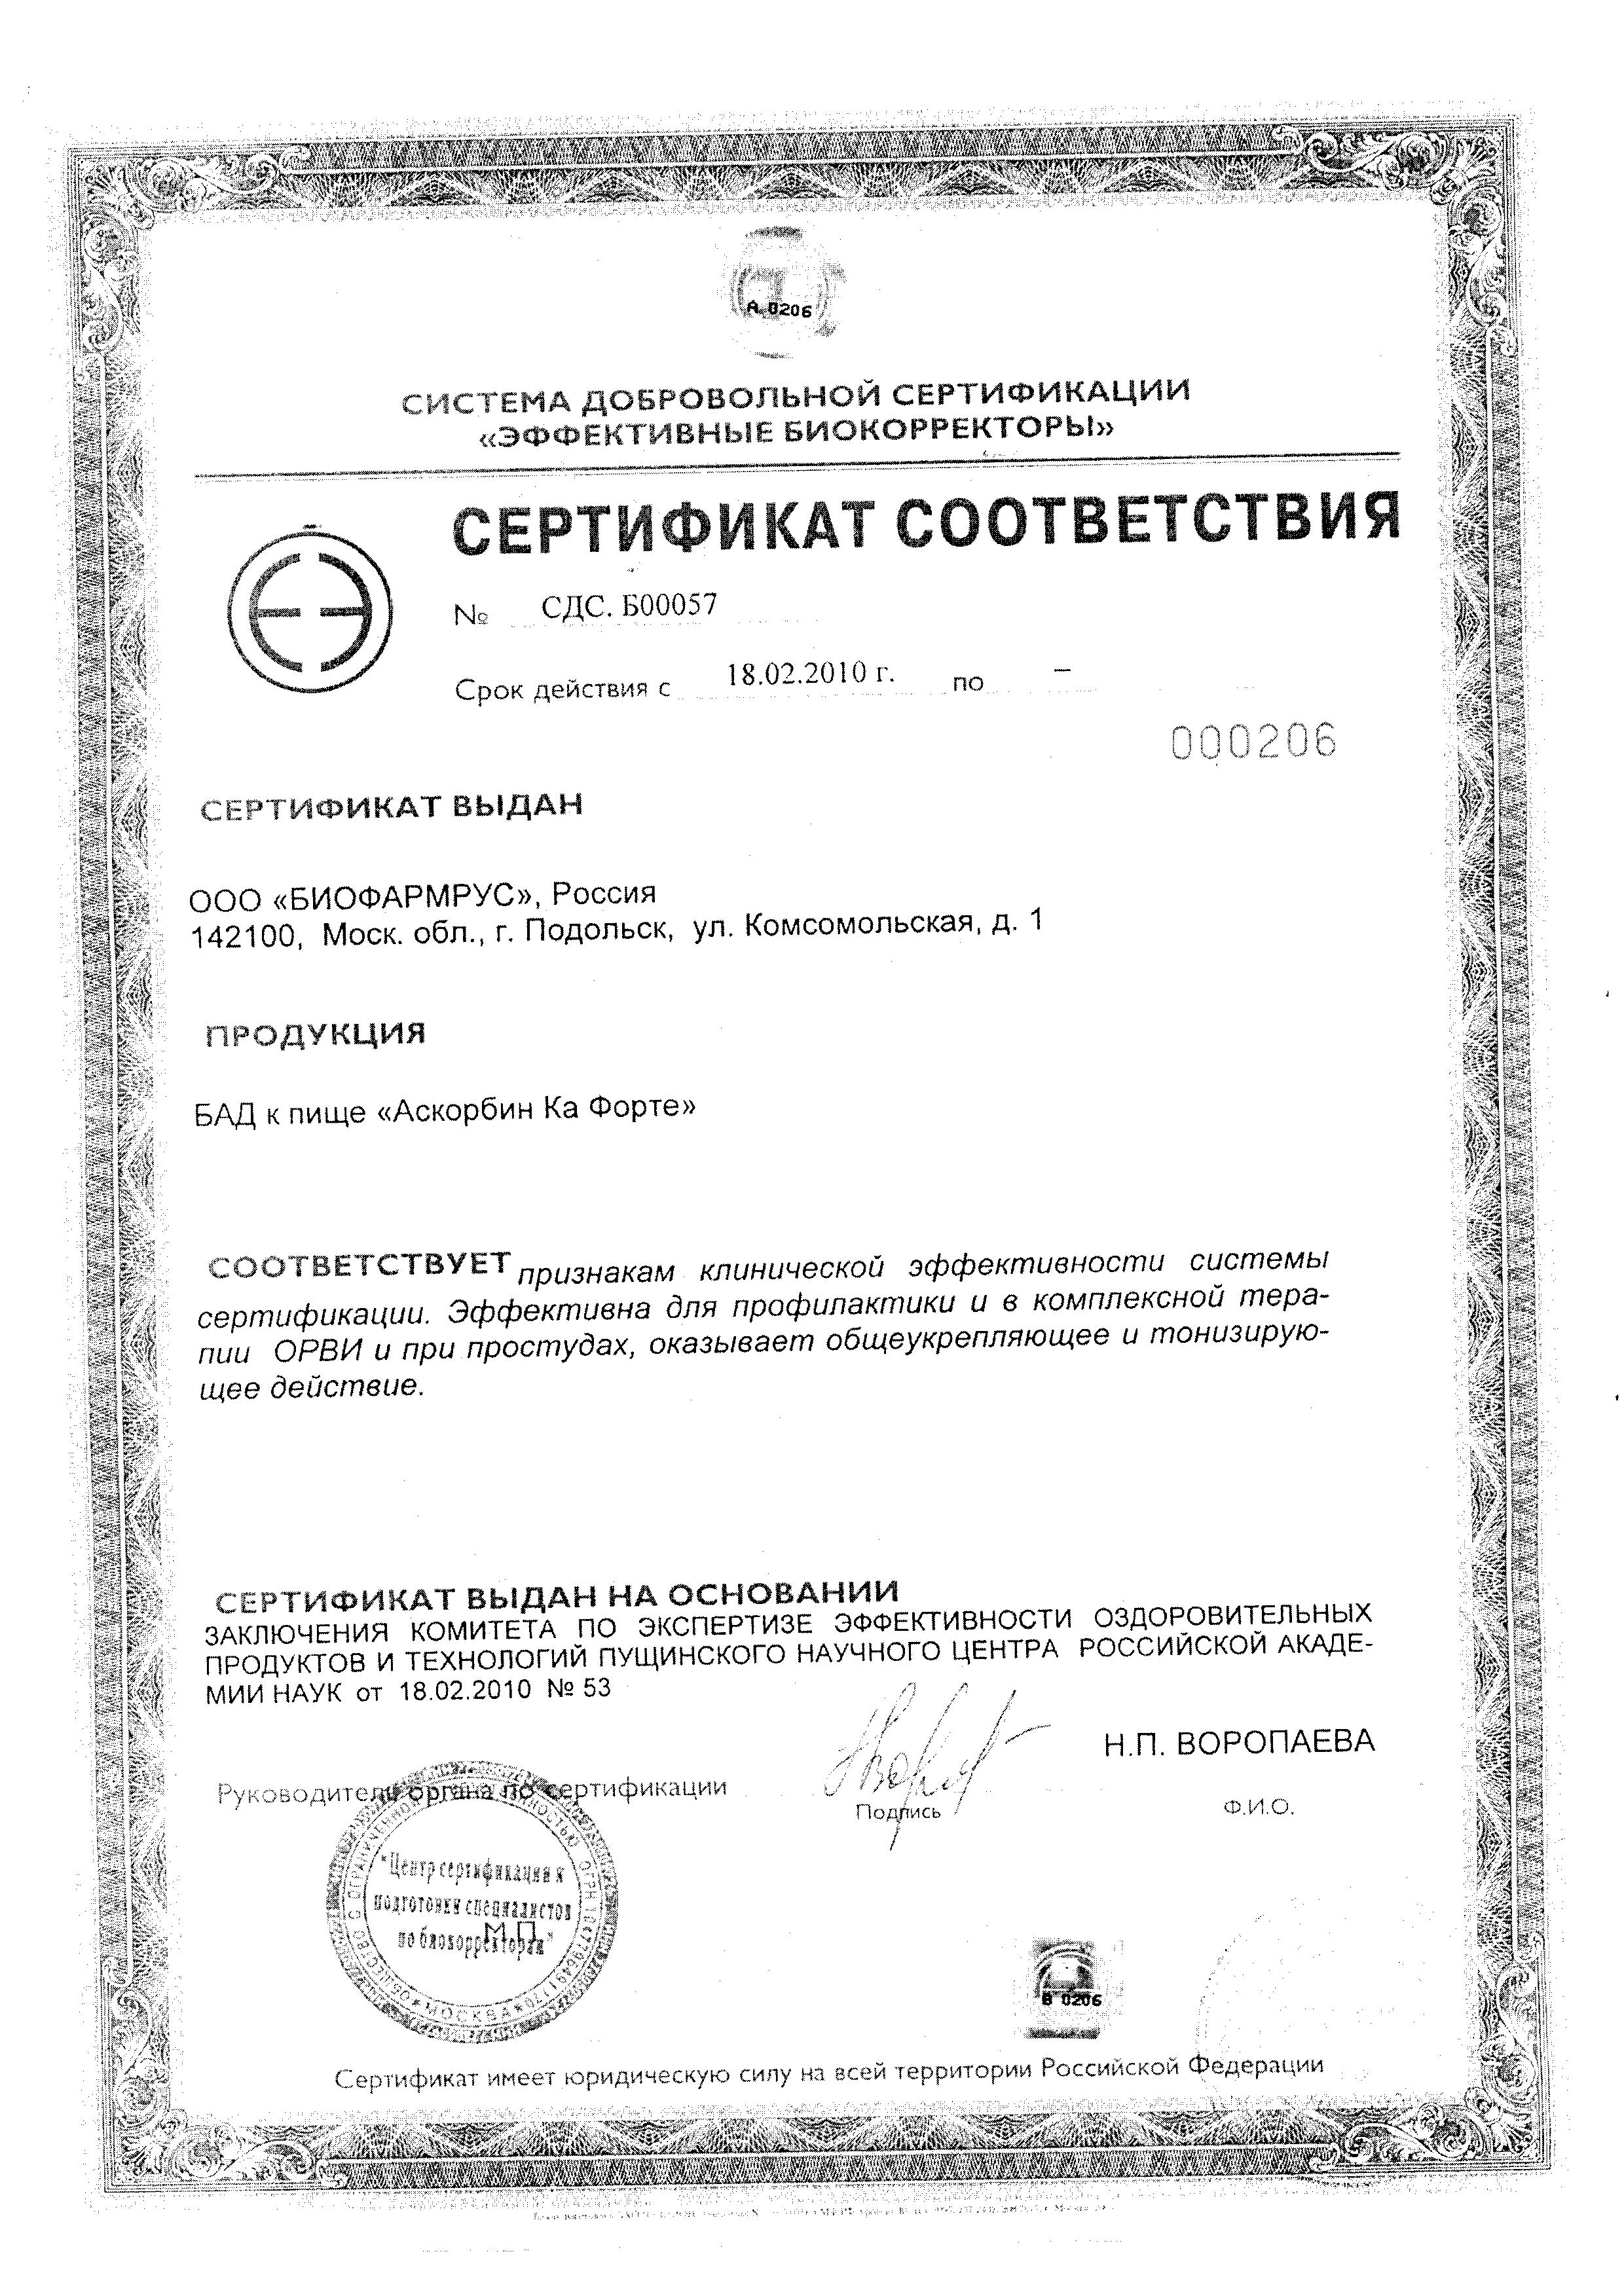 Аскорбин Ка Форте сертификат